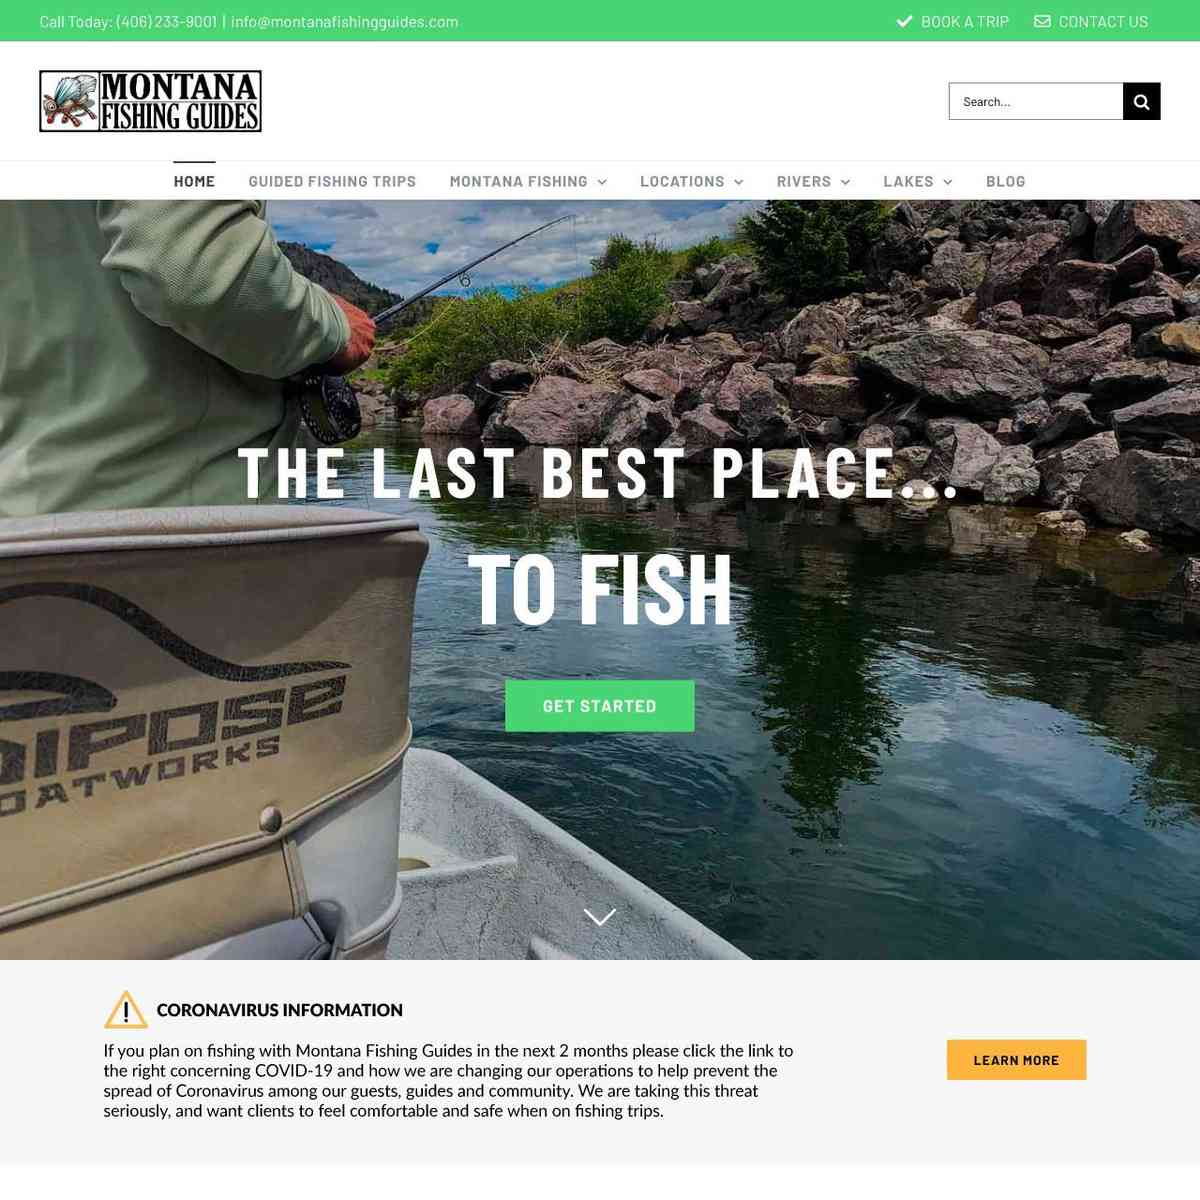 montanafishingguides.com/